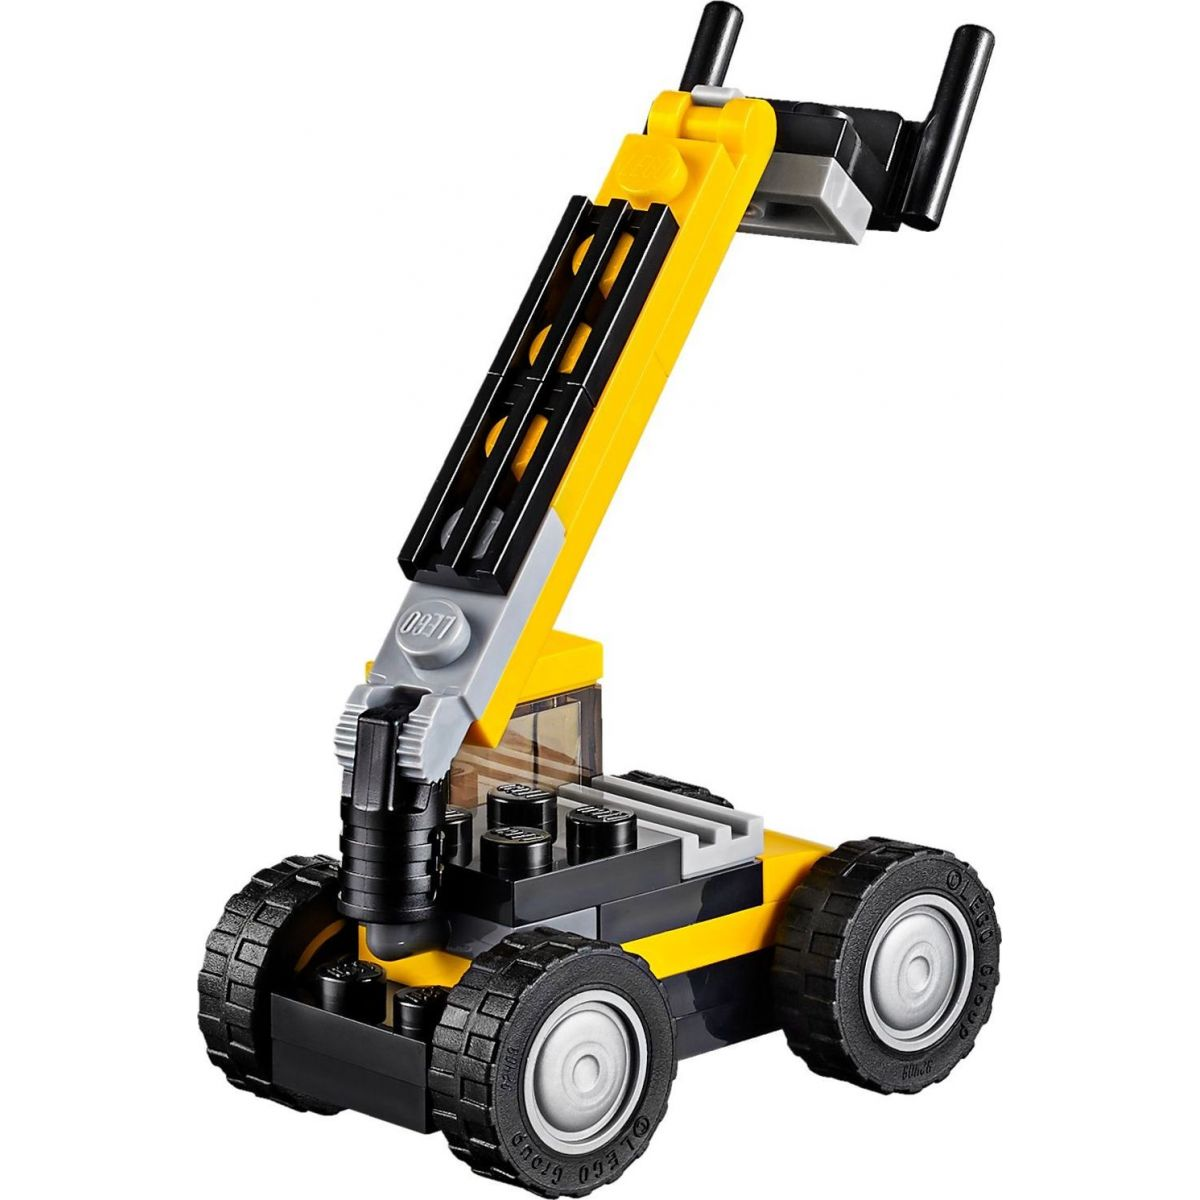 LEGO Creator 31041 Vozidla na stavbě #5